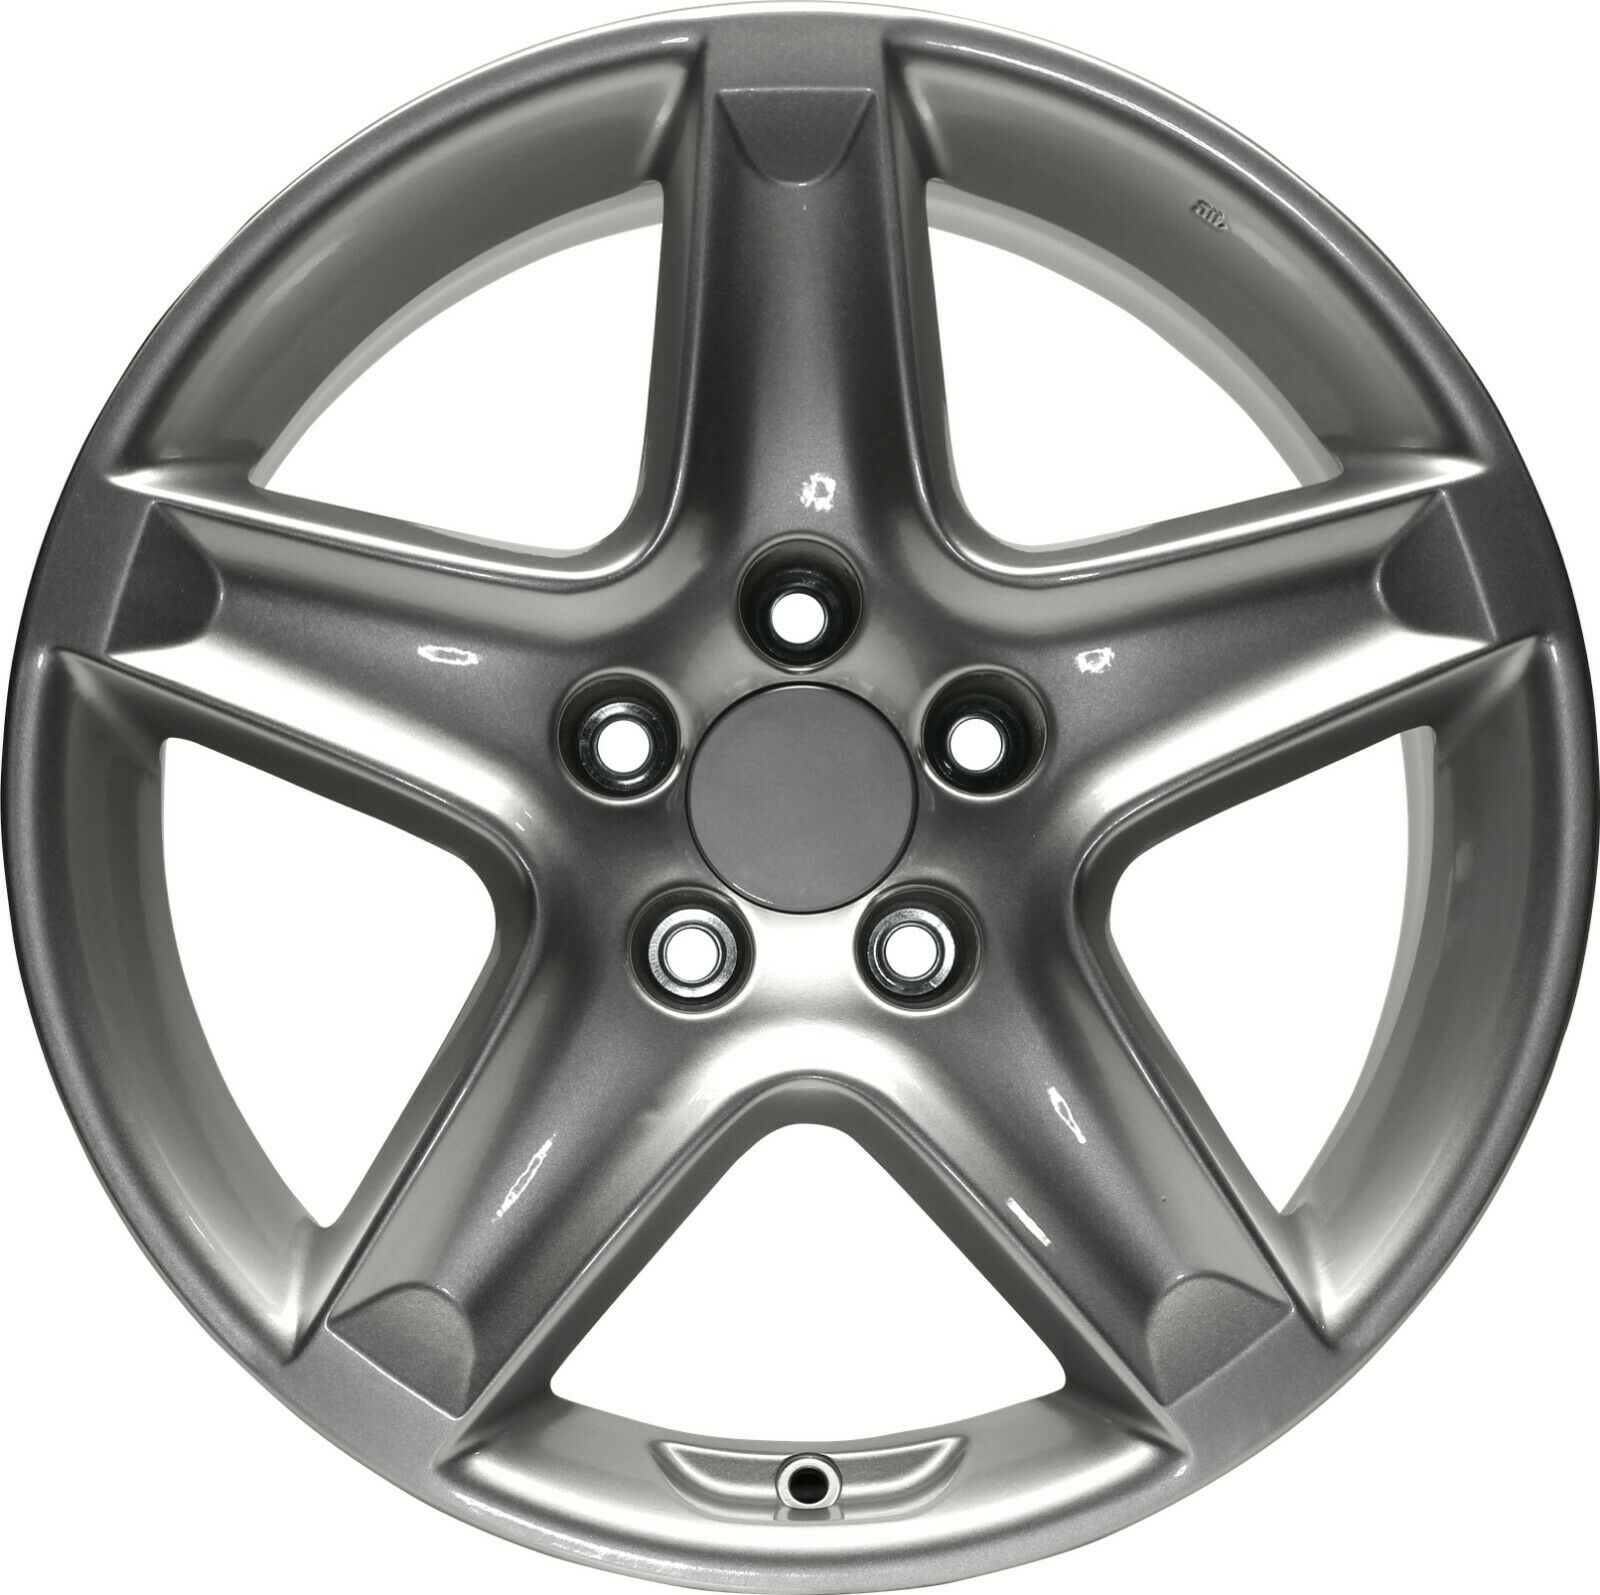 Wheel 2006 Acura TL 17 Inch Aluminum Rim 5 Lug 114.3mm